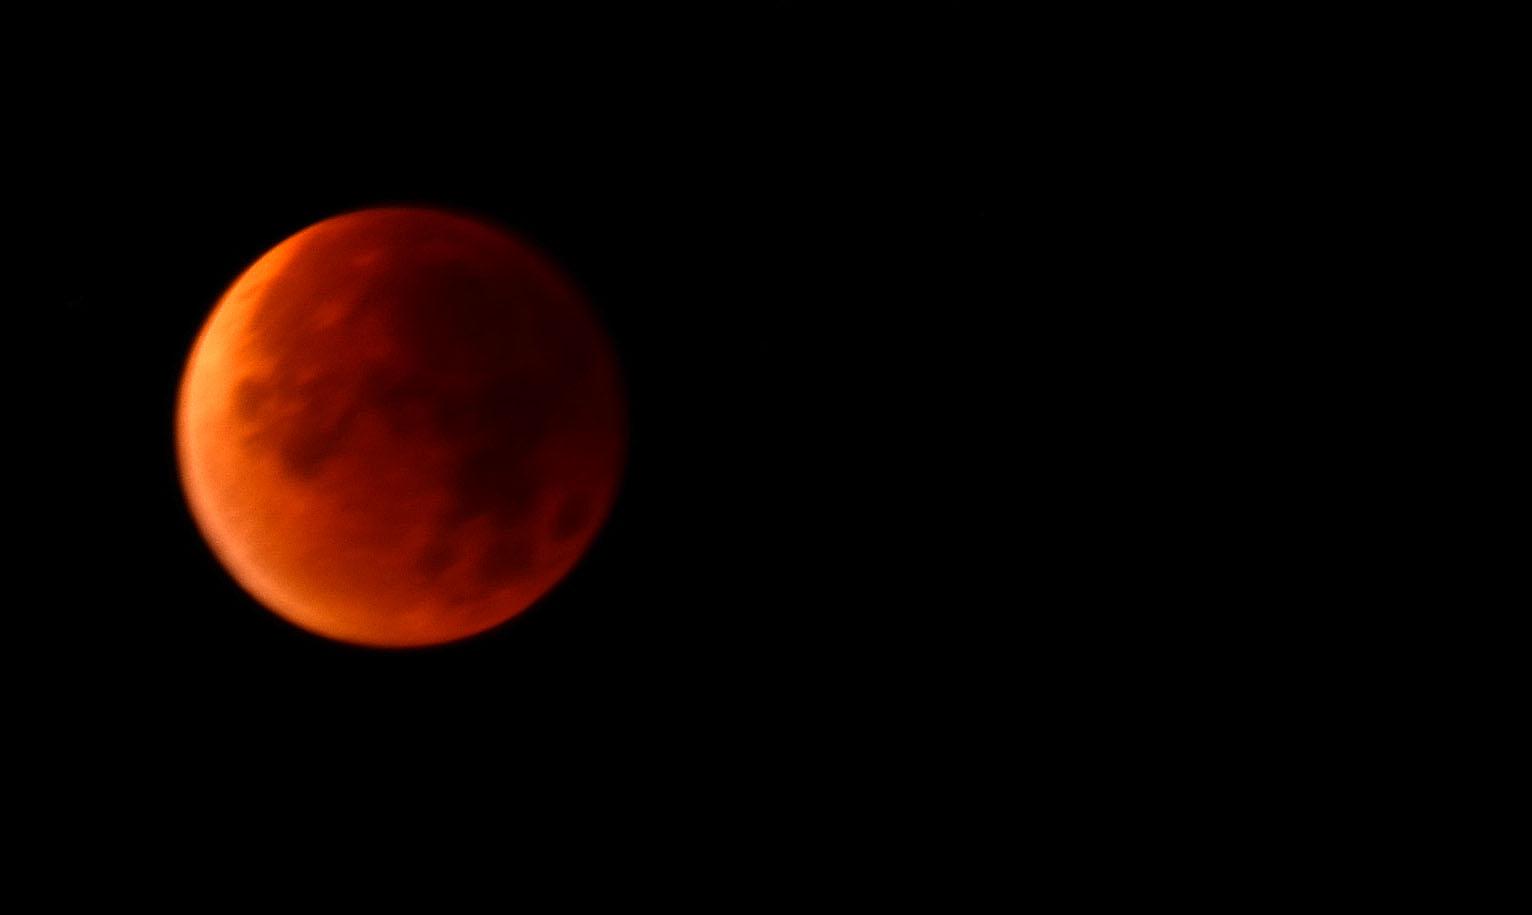 måne röd